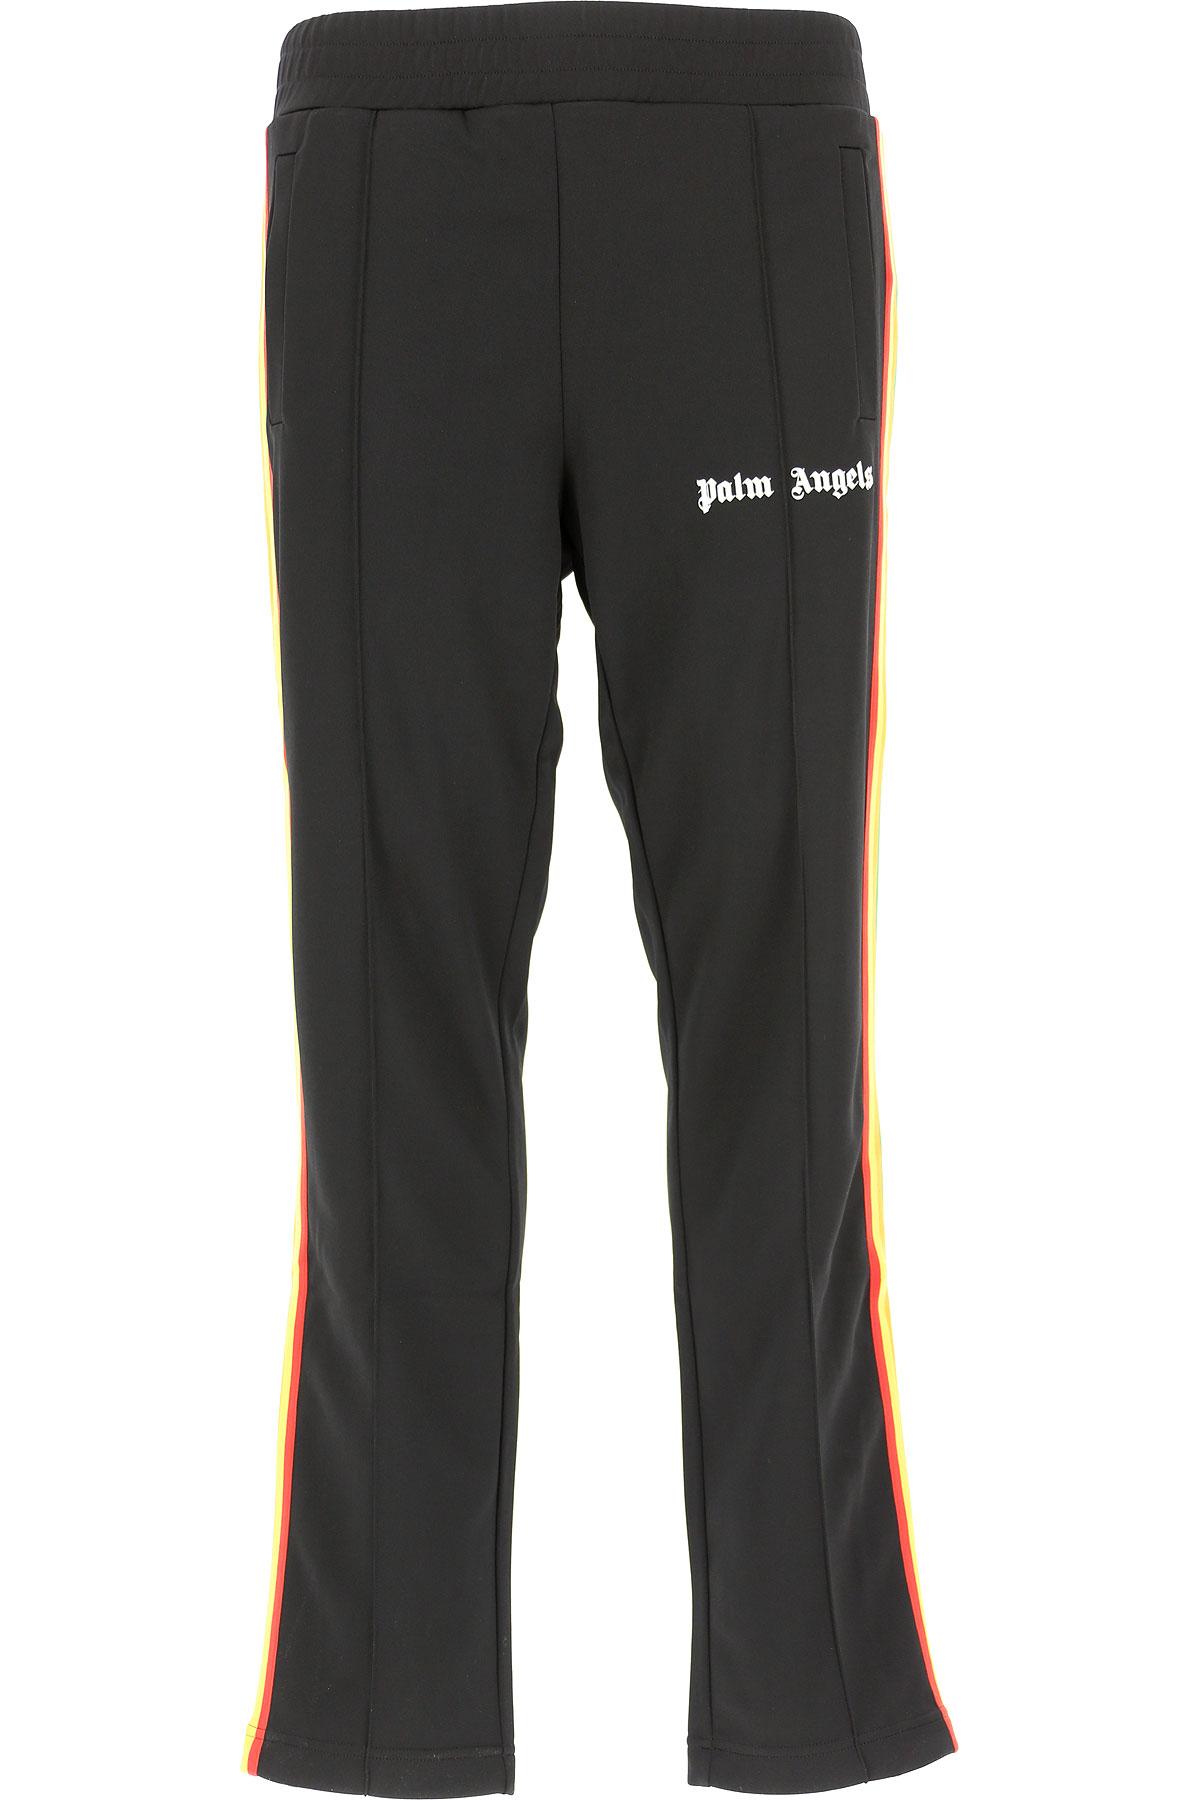 Image of Palm Angels Pants for Men, Black, polyestere, 2017, L XL